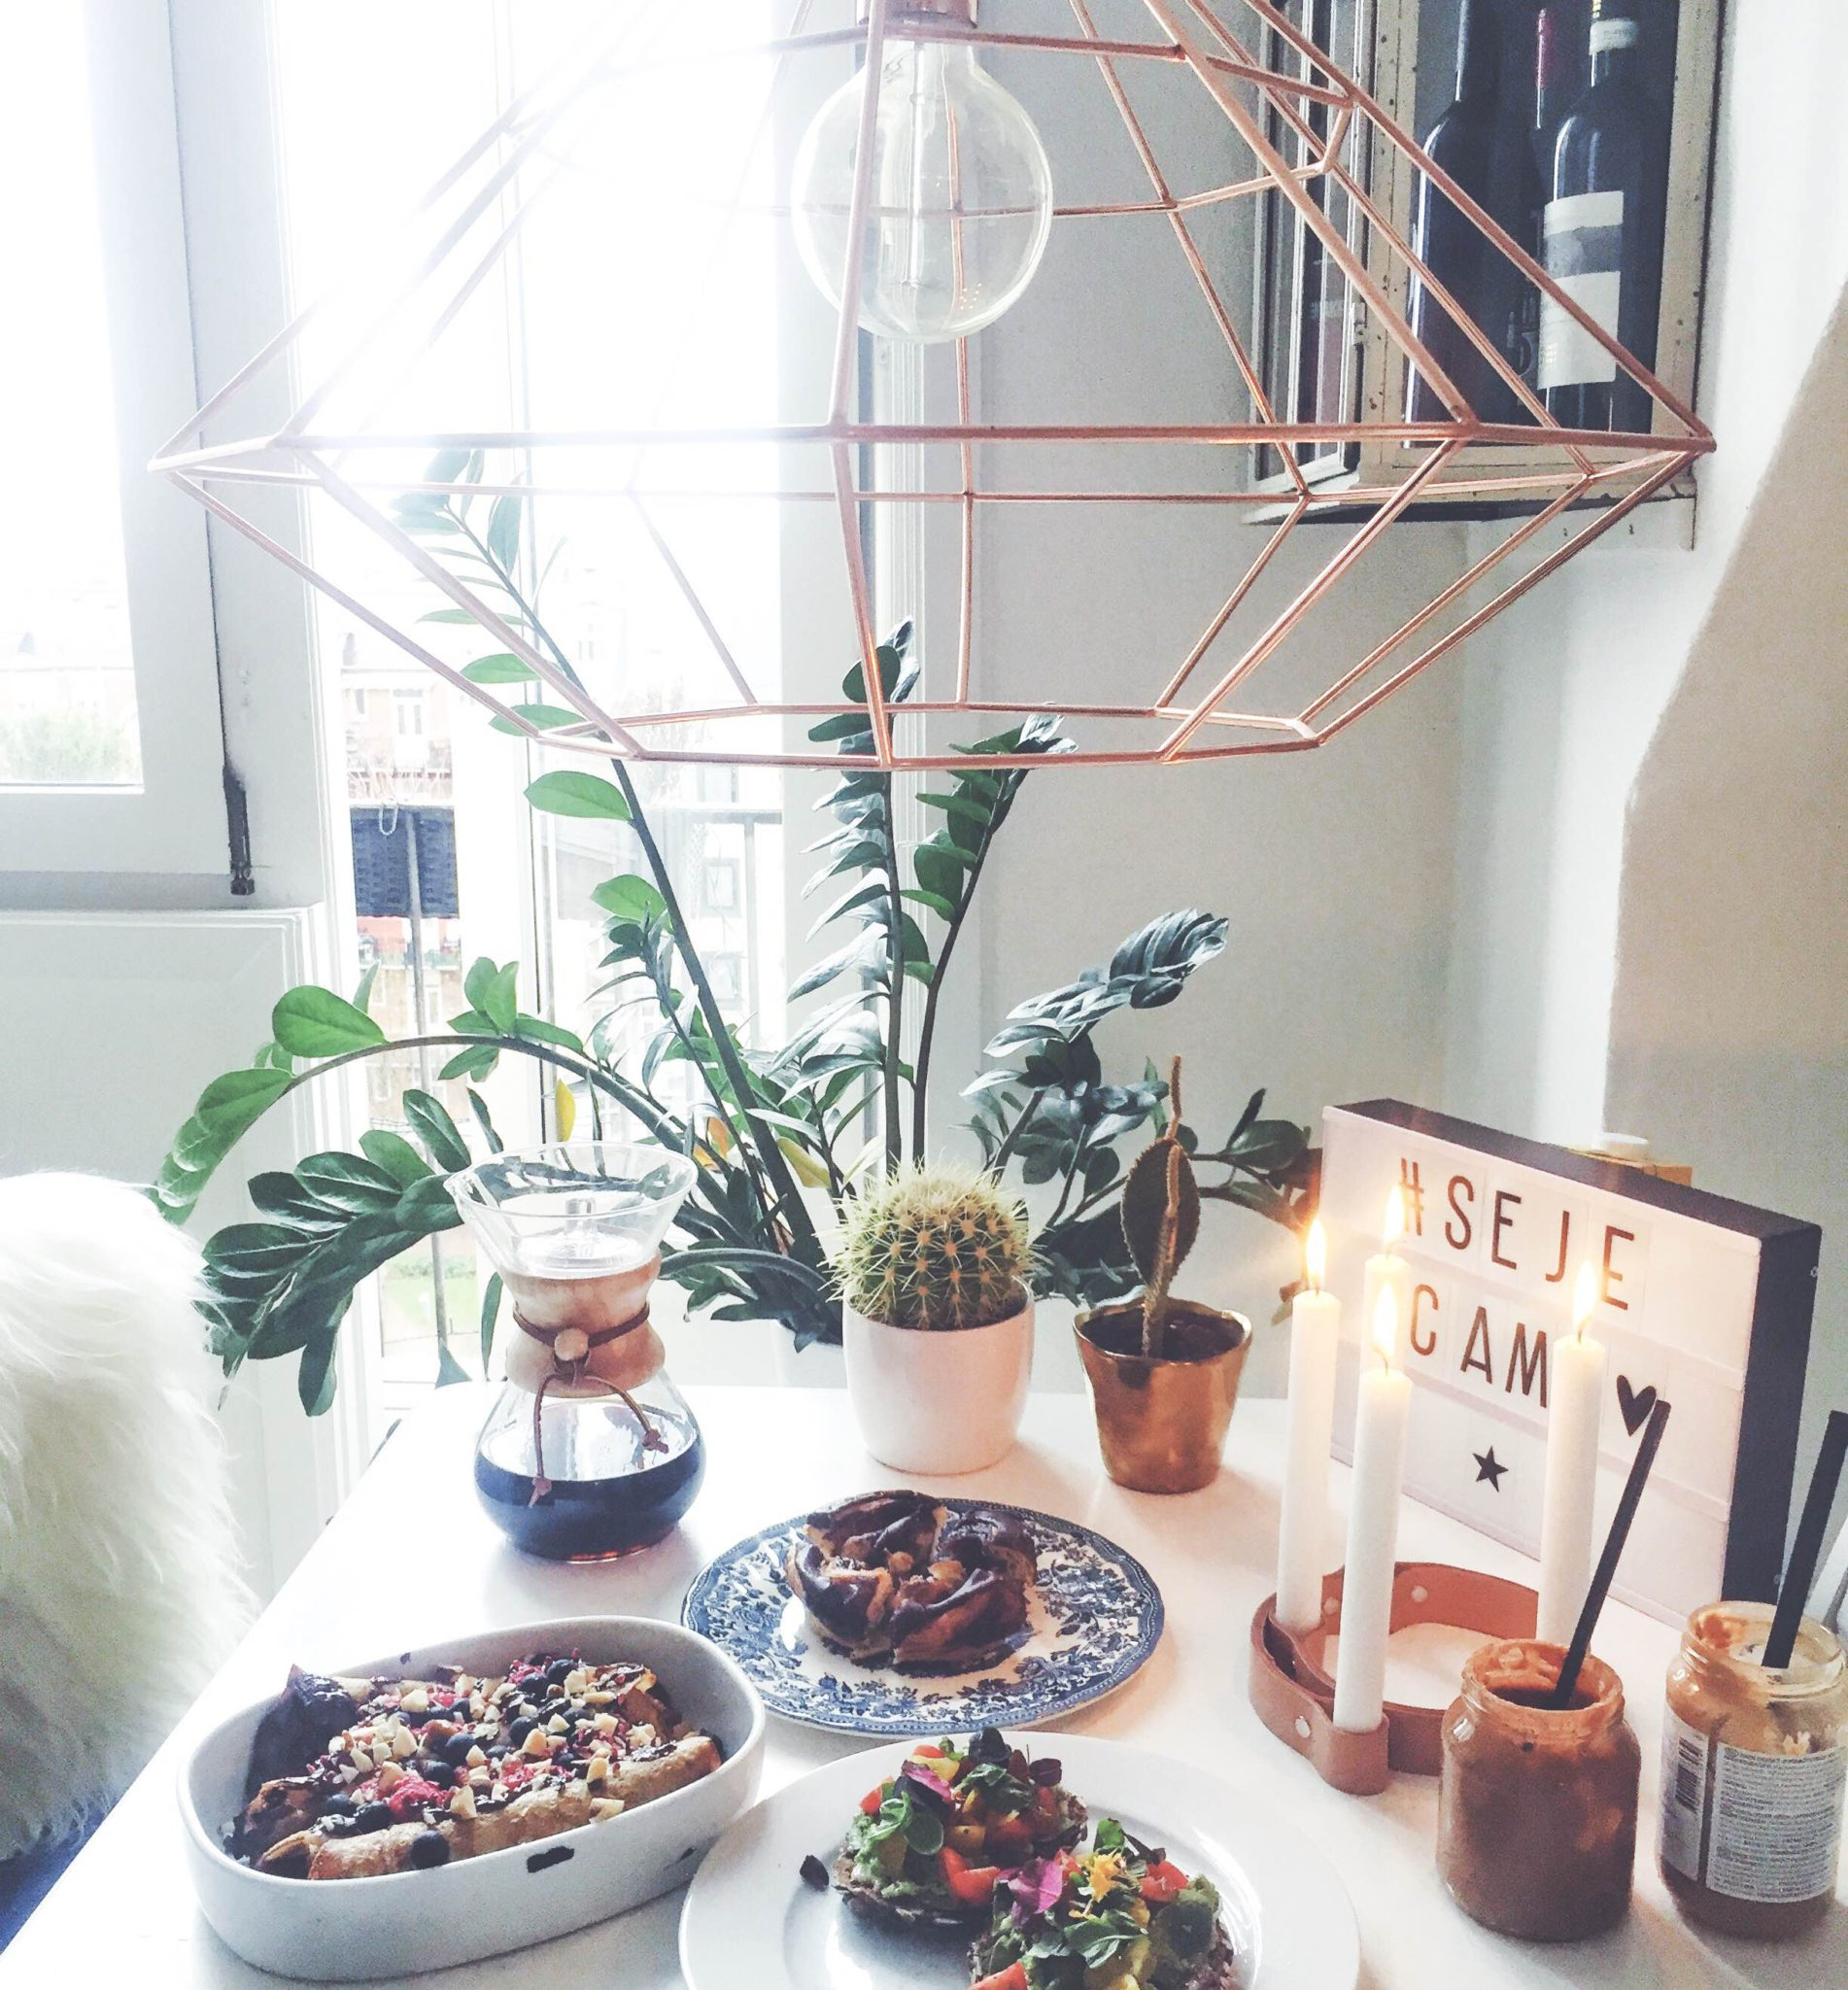 Fødselsdag. Morgenmad med sunde pandekager, avokadomad, kaffe, gurkemeje og ingefær shots, chemex kaffe, juice, peanutbutter og grønne planter